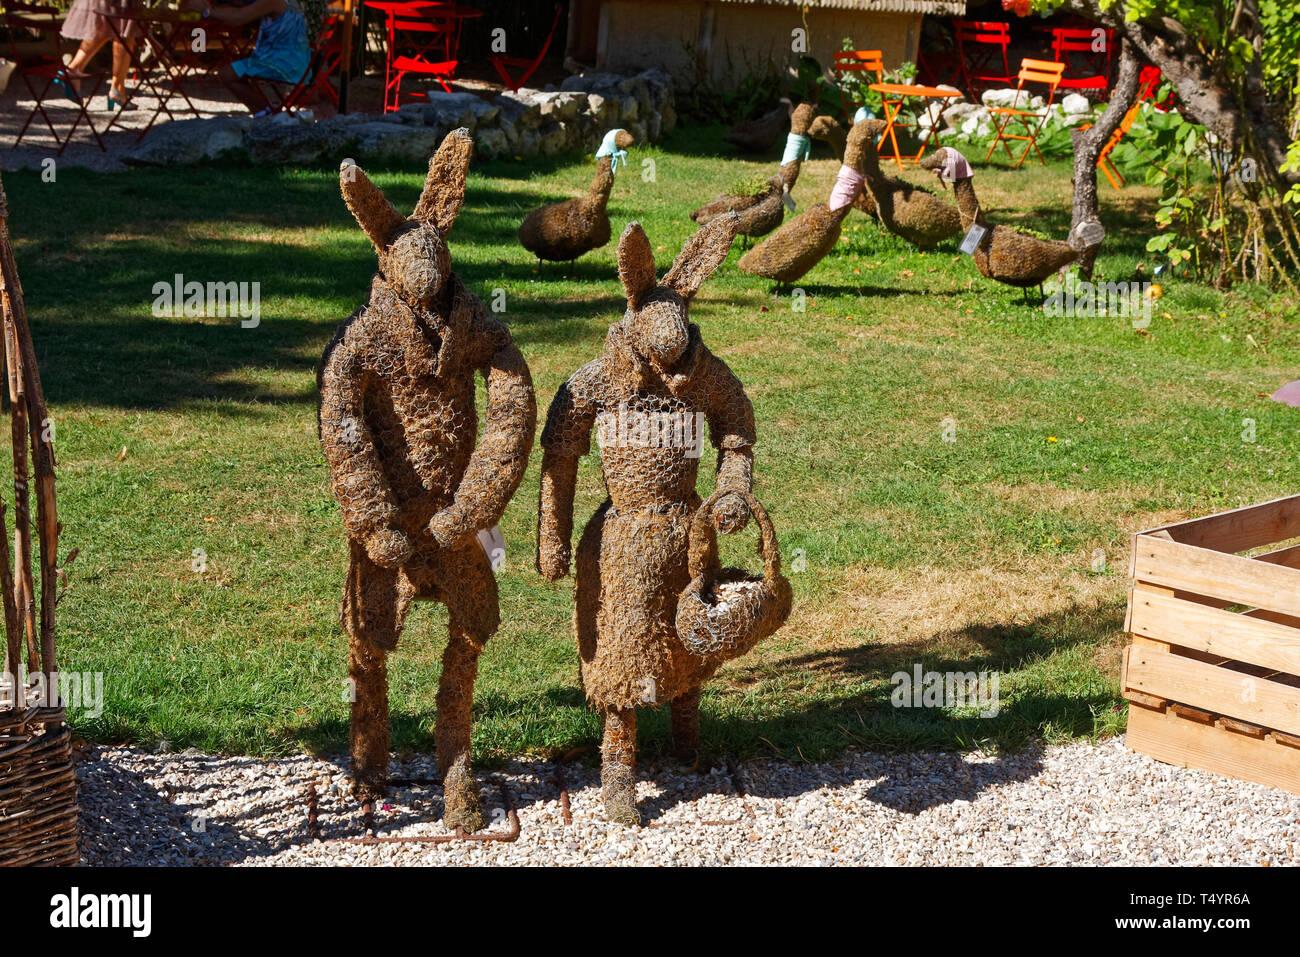 Wire Rabbit Stock Photos & Wire Rabbit Stock Images - Alamy